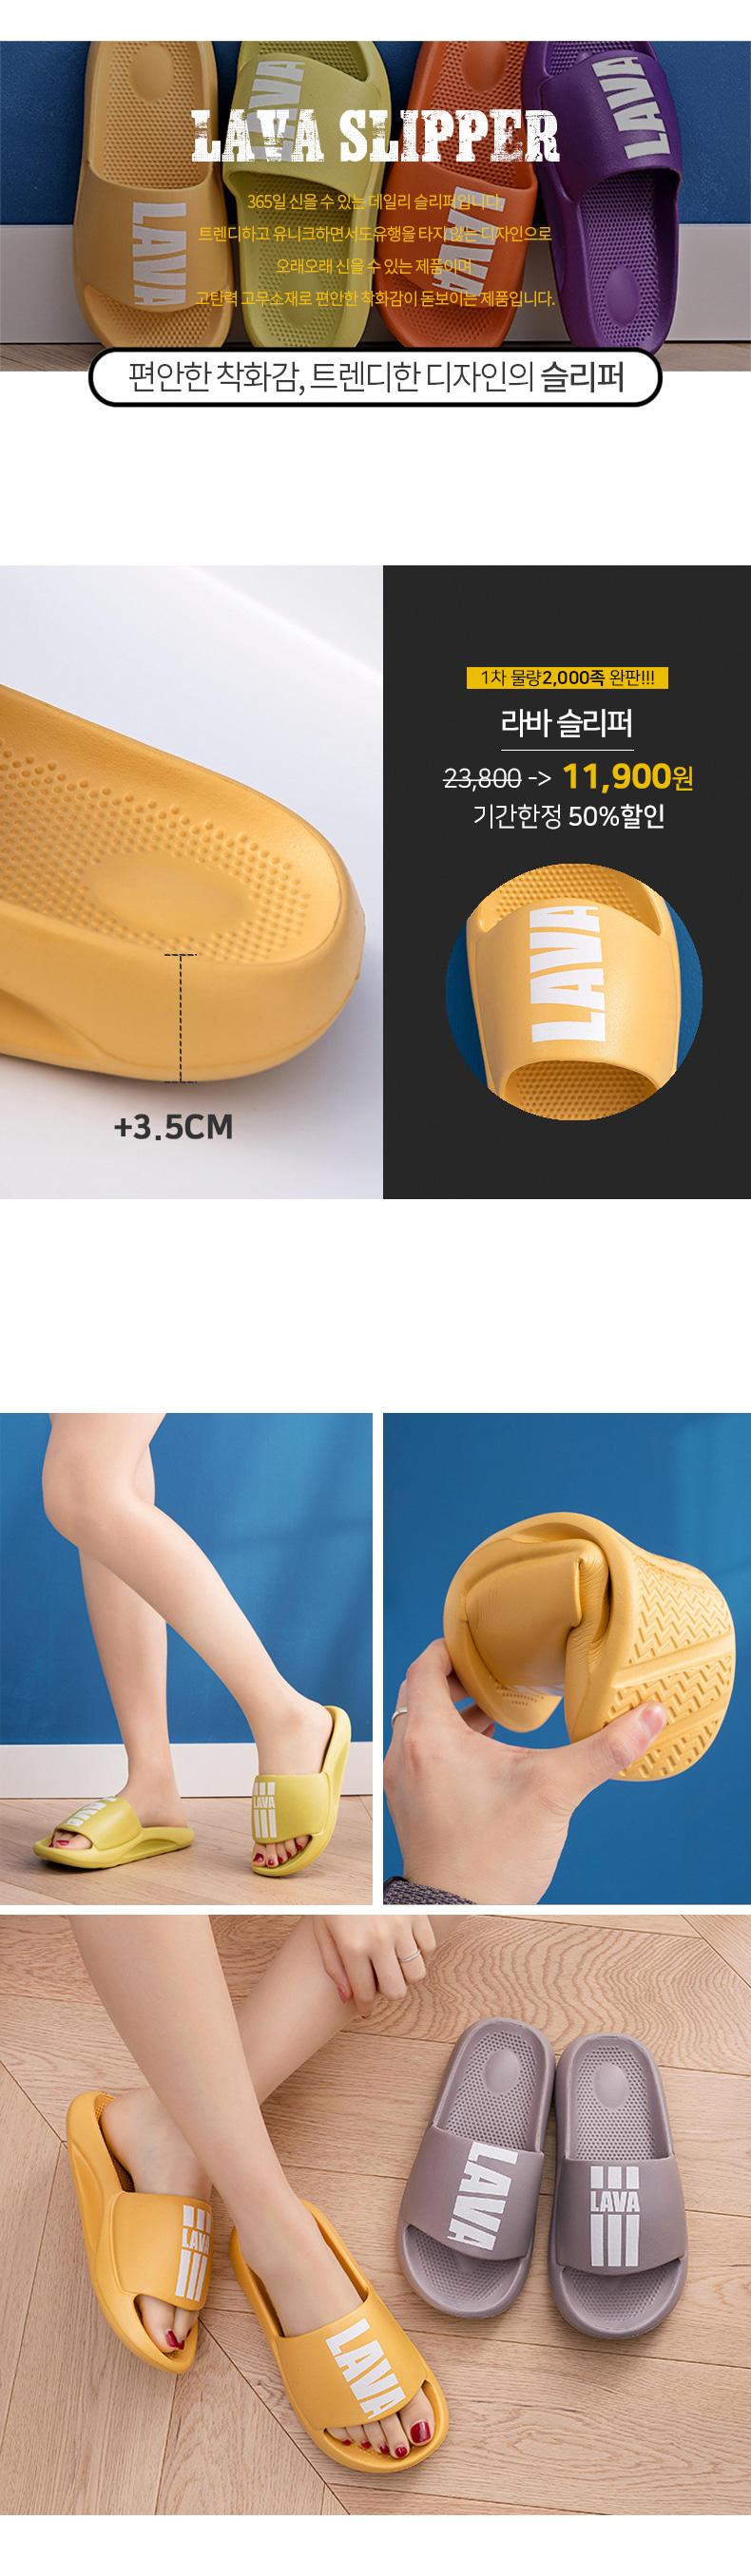 Laba slippers S#JI057